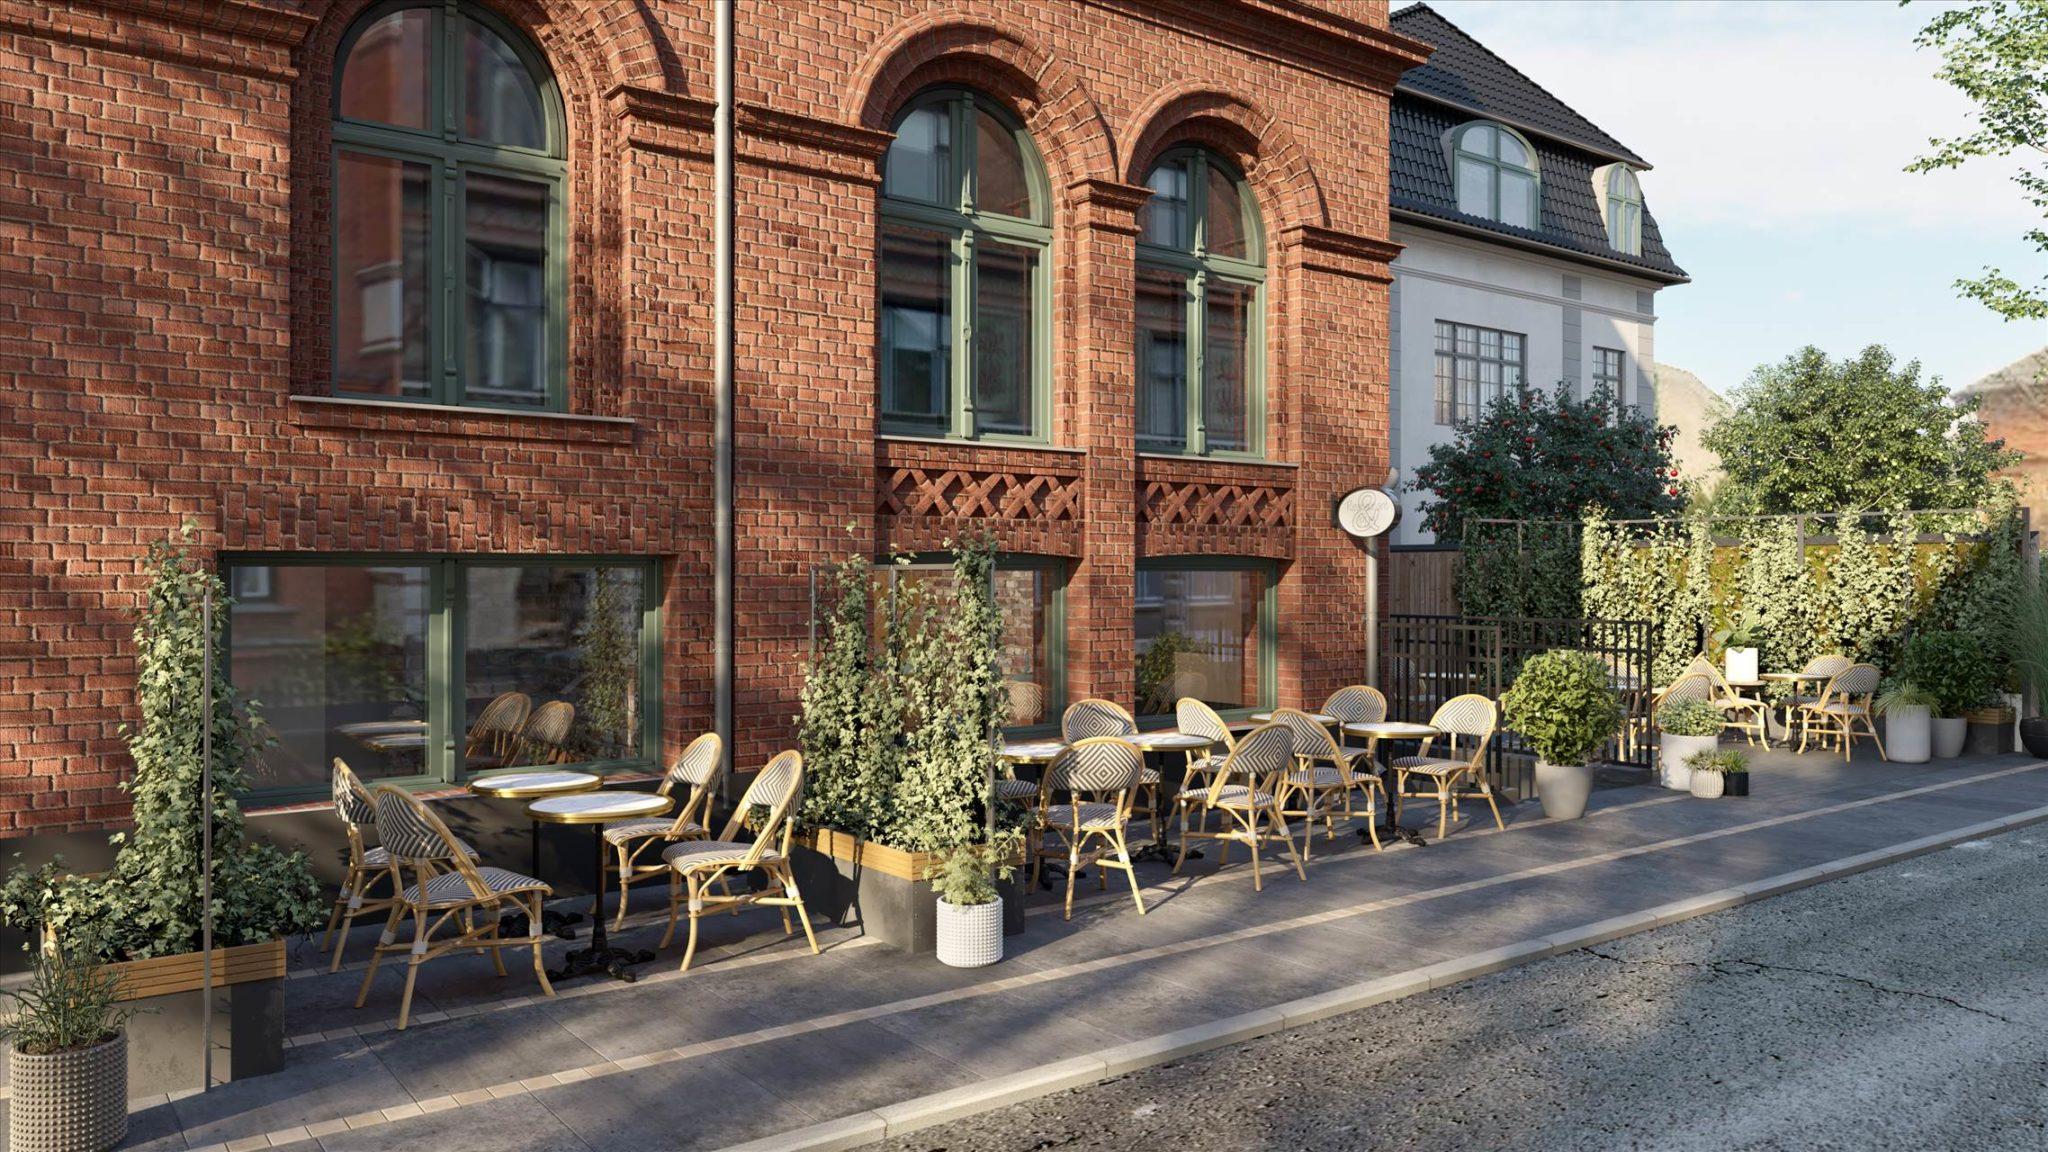 82 m² butik • Ved Gammel Kongevej